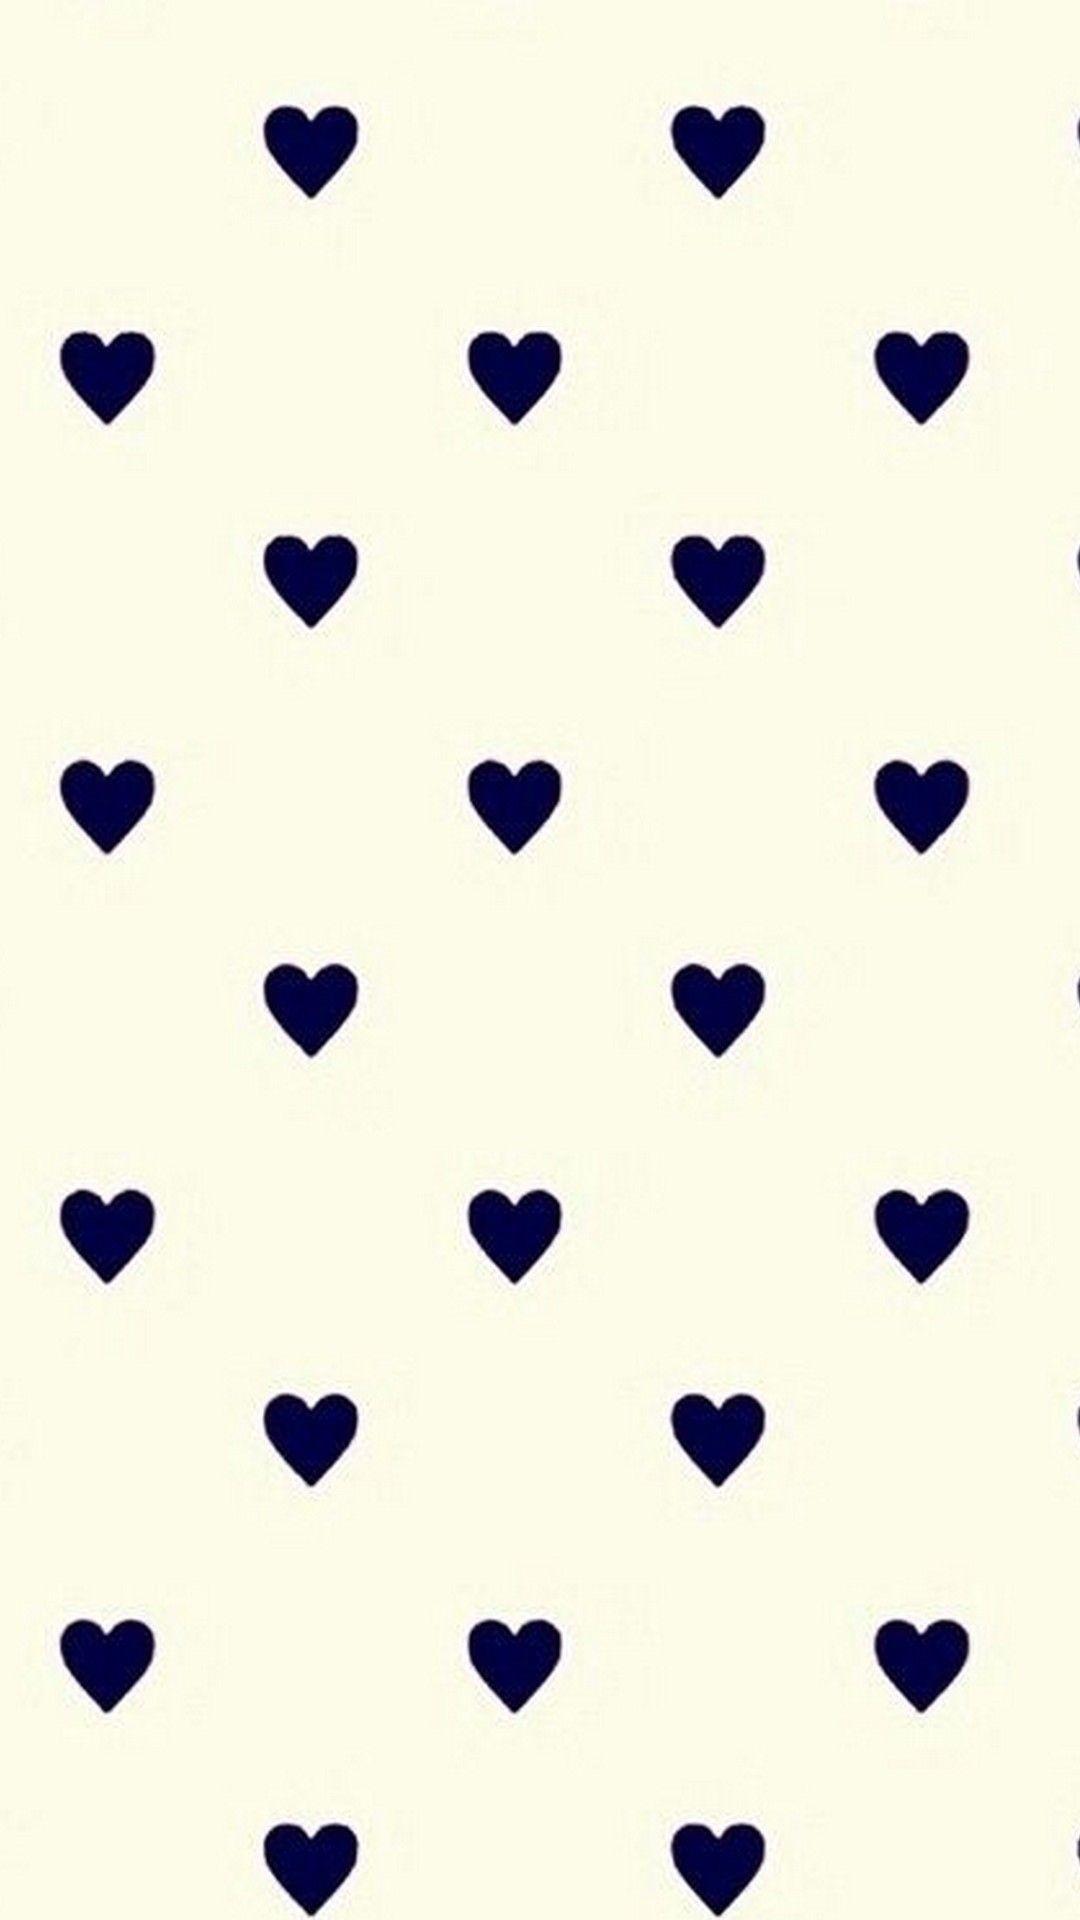 1080x1920, White Cute Girly Wallpaper Mobile - Girly Hd Wallpaper For Mobile - HD Wallpaper